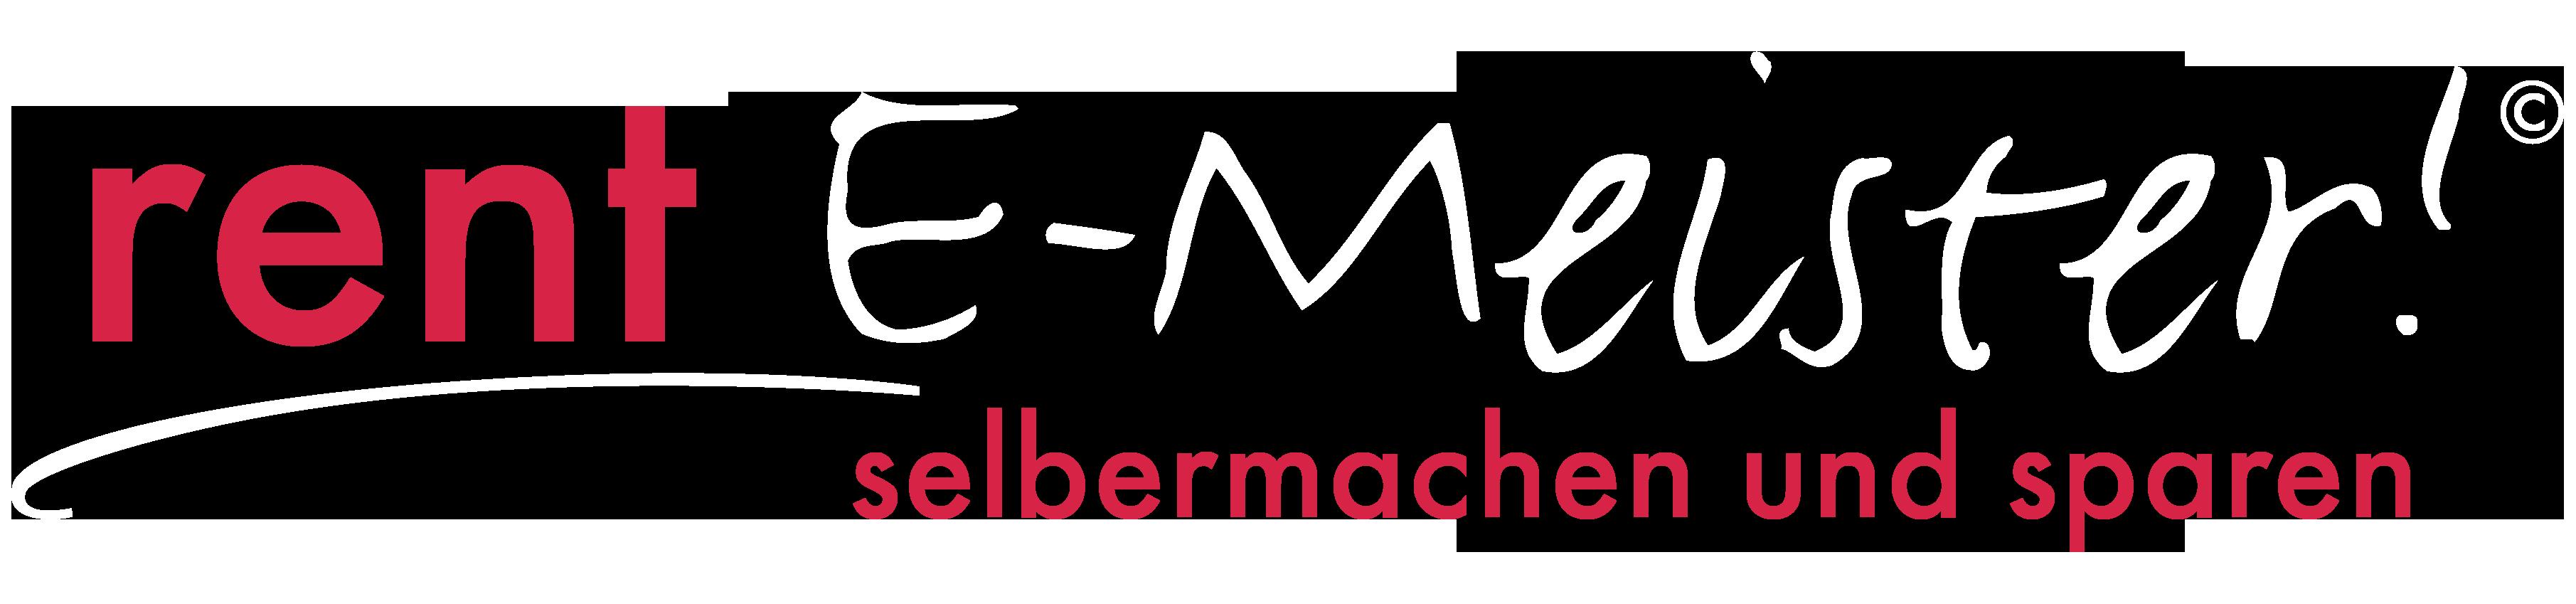 rent e-meister - elektro selbermachen